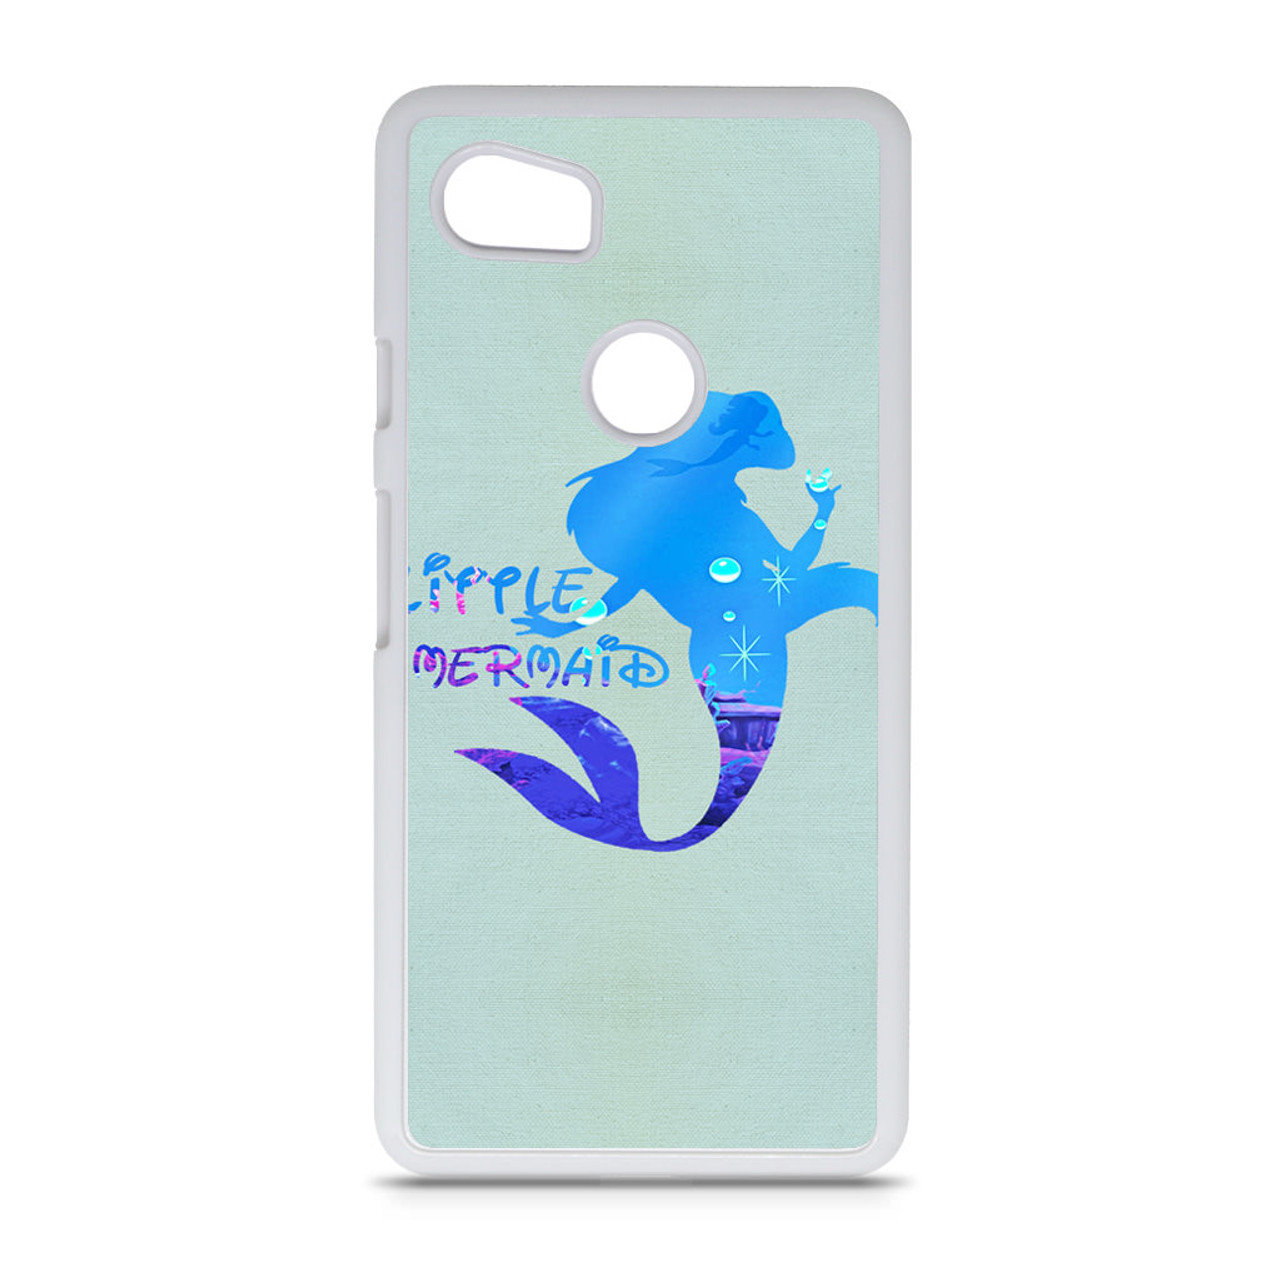 Ariel Quote Little Mermaid Disney Google Pixel 2 XL Case